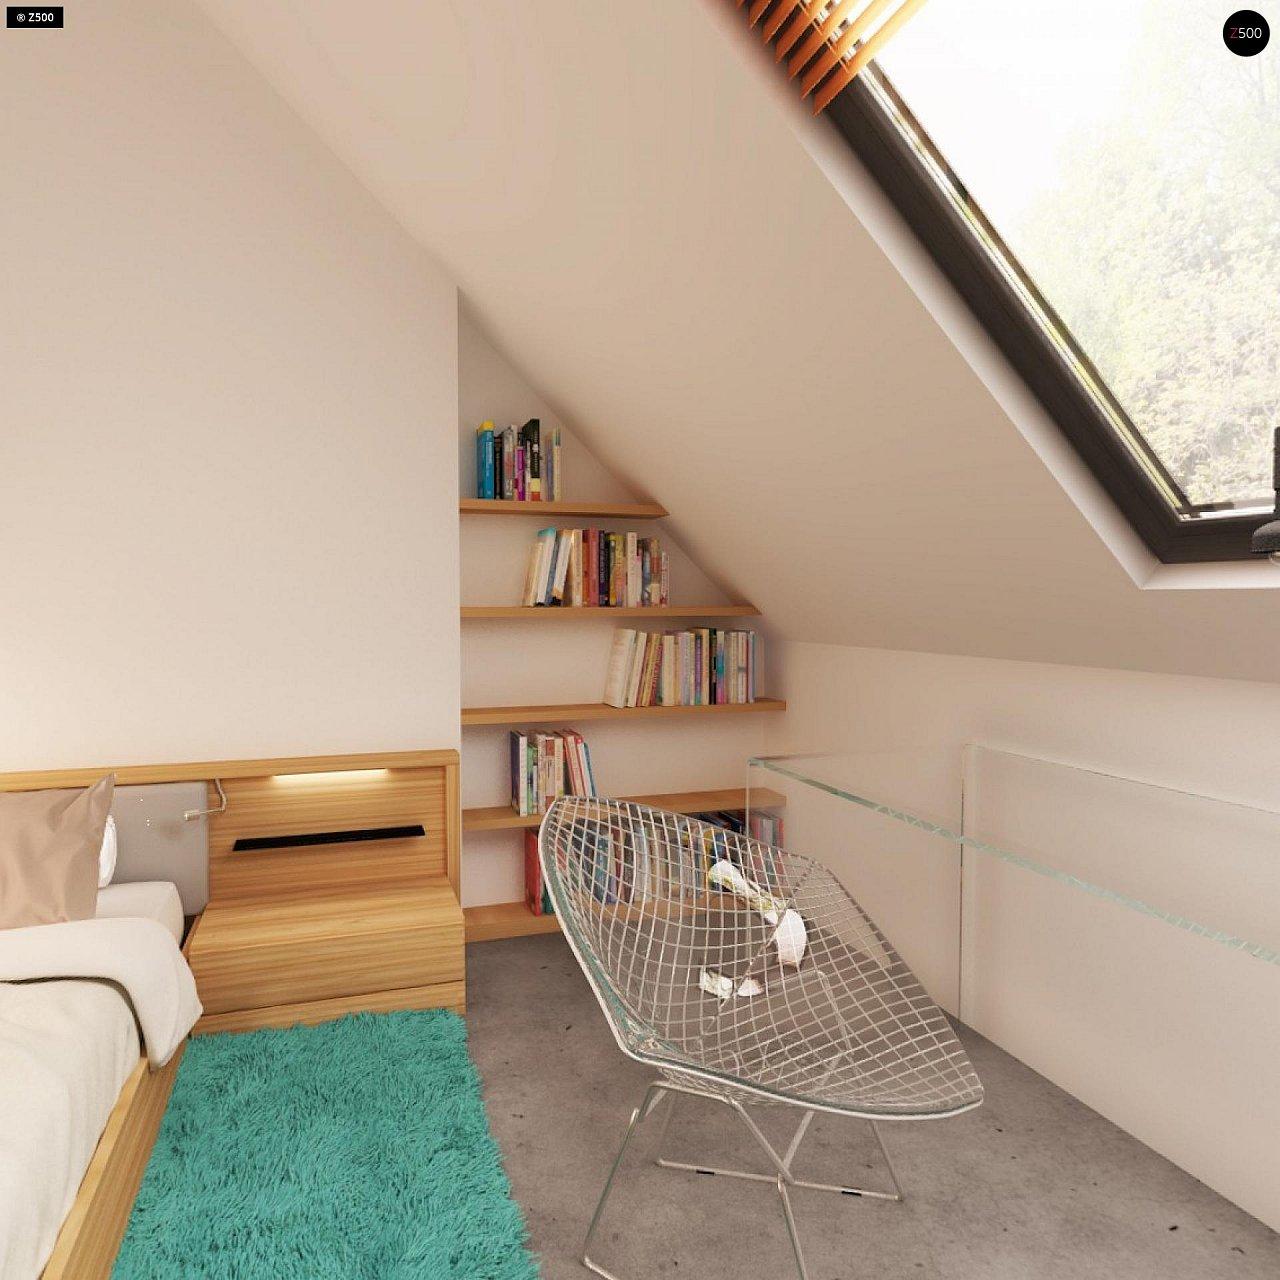 Проект практичного дома с эркером и гаражом на одну машину. 16